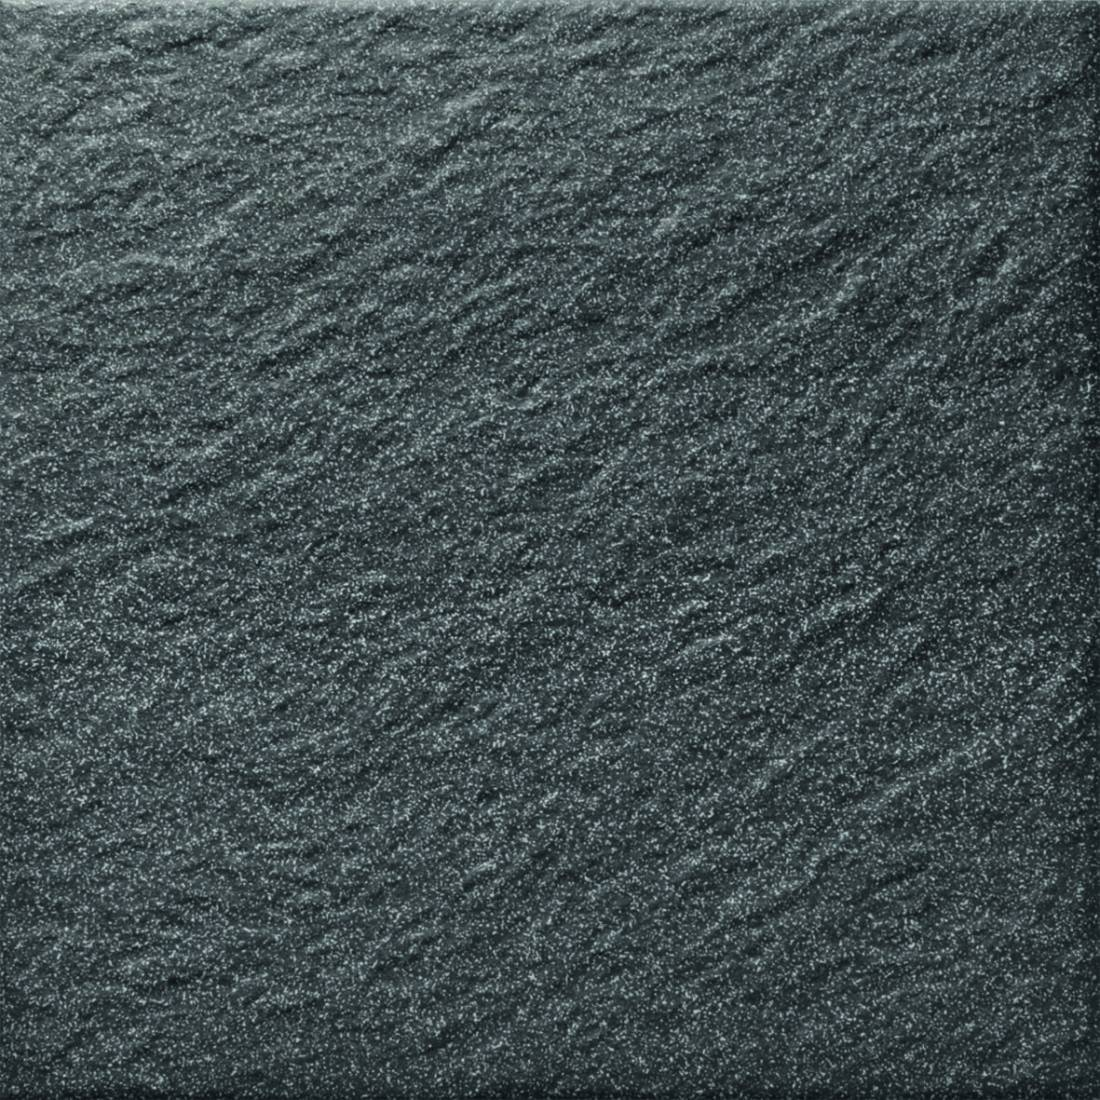 Granit 30x30 Rio Negro Black Matt R11 1